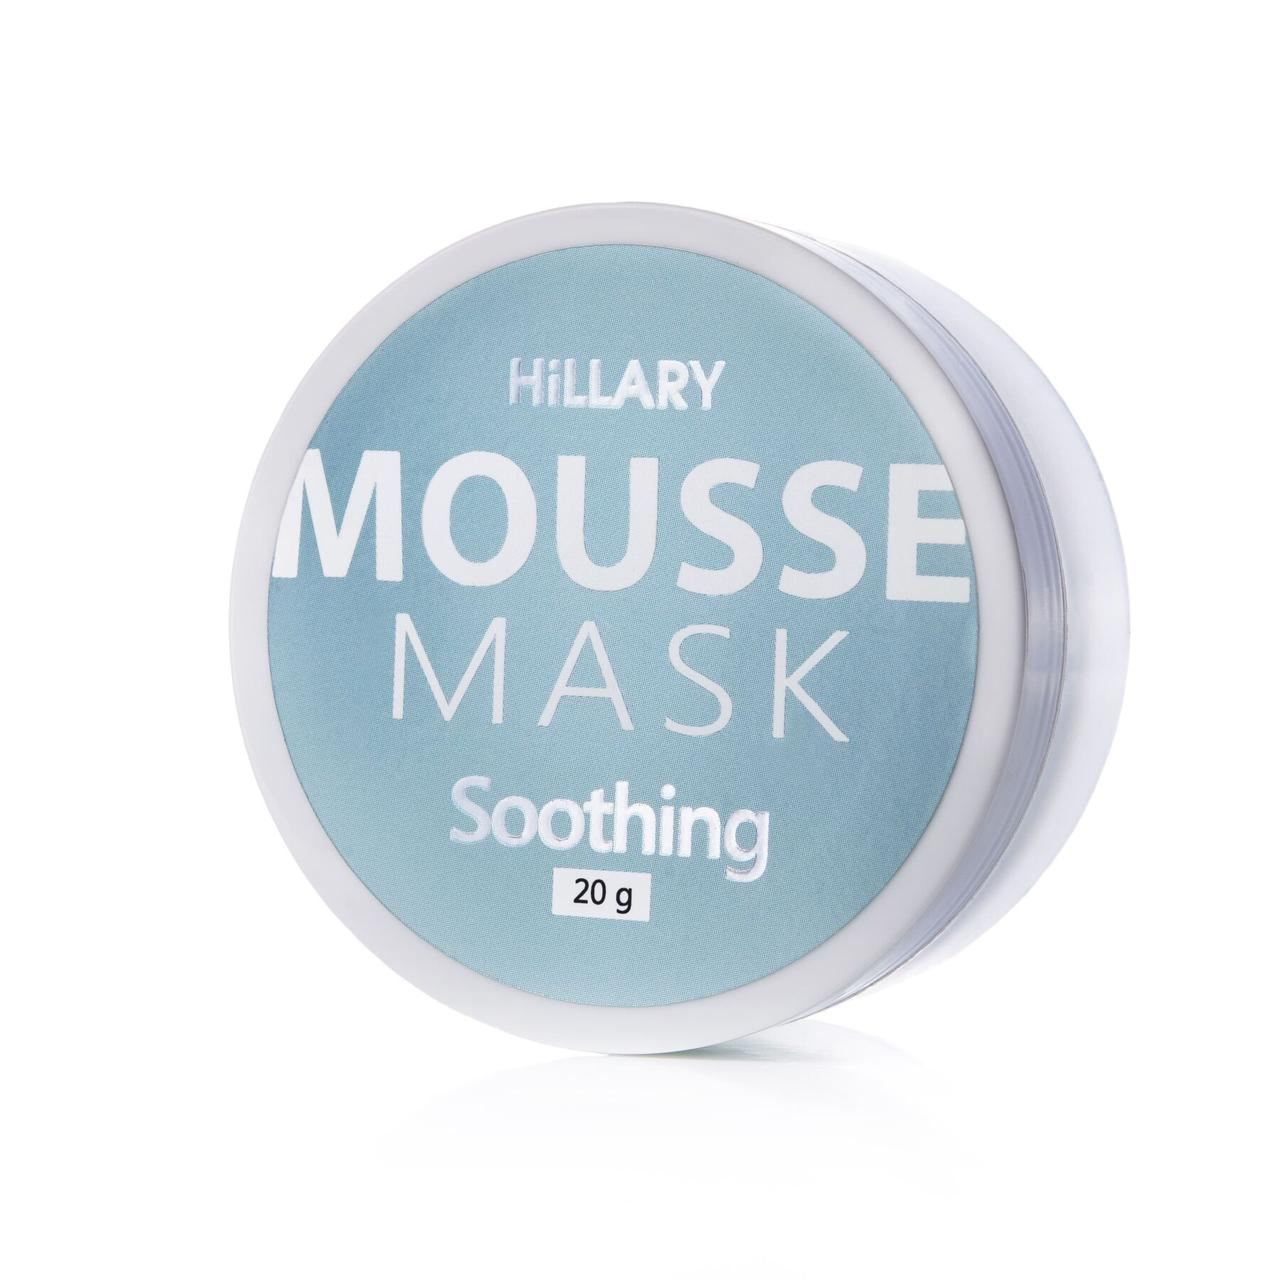 Мусс-маска для лица успокаивающая Hillary MOUSSE MASK Soothing, 20 г